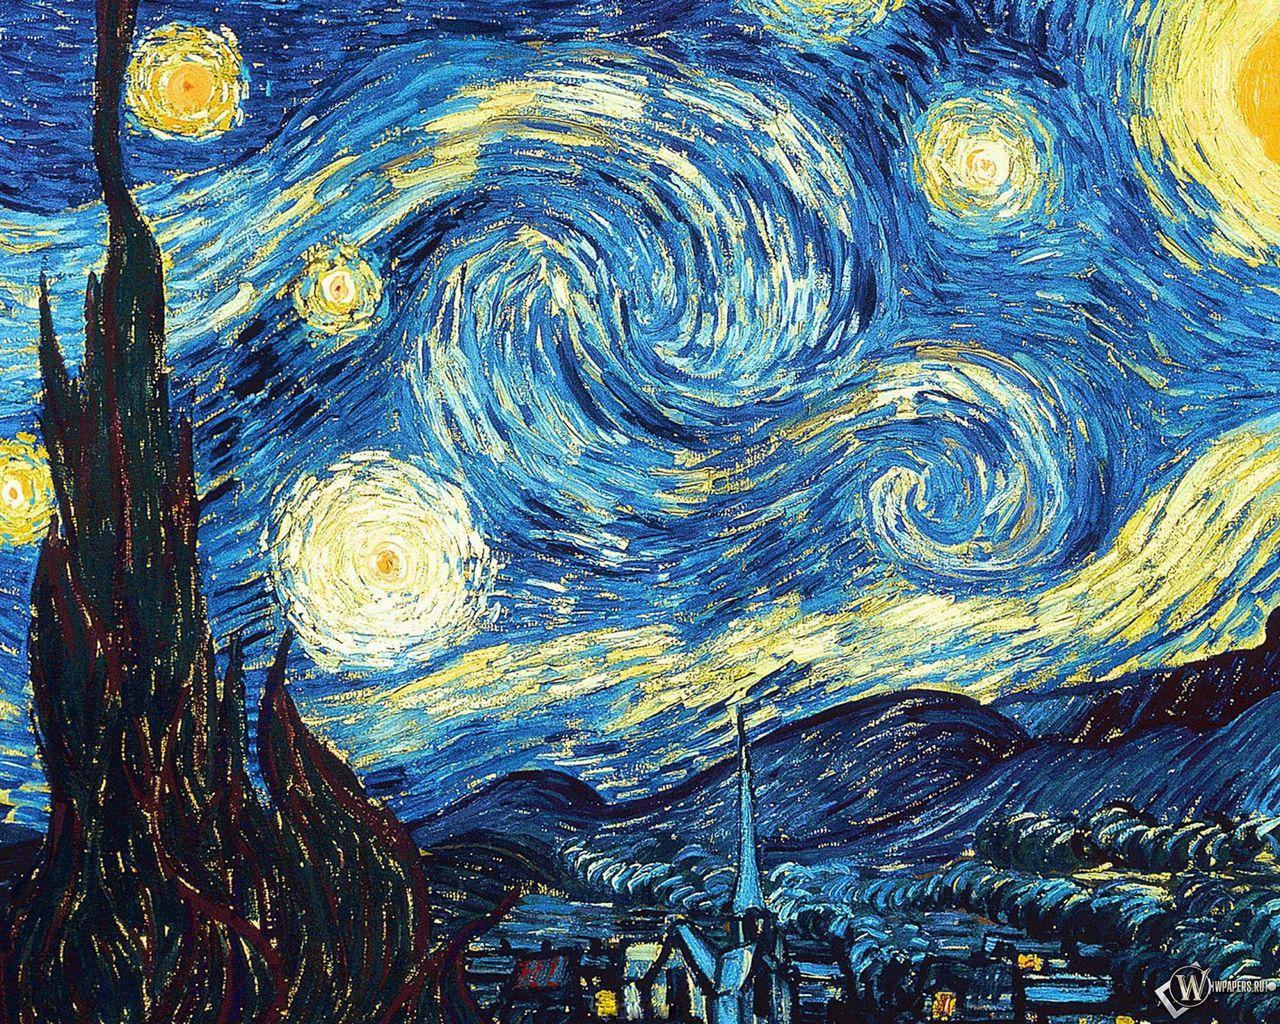 1280x1024 Wallpaper vincent van gogh, the starry night, oil, canvas